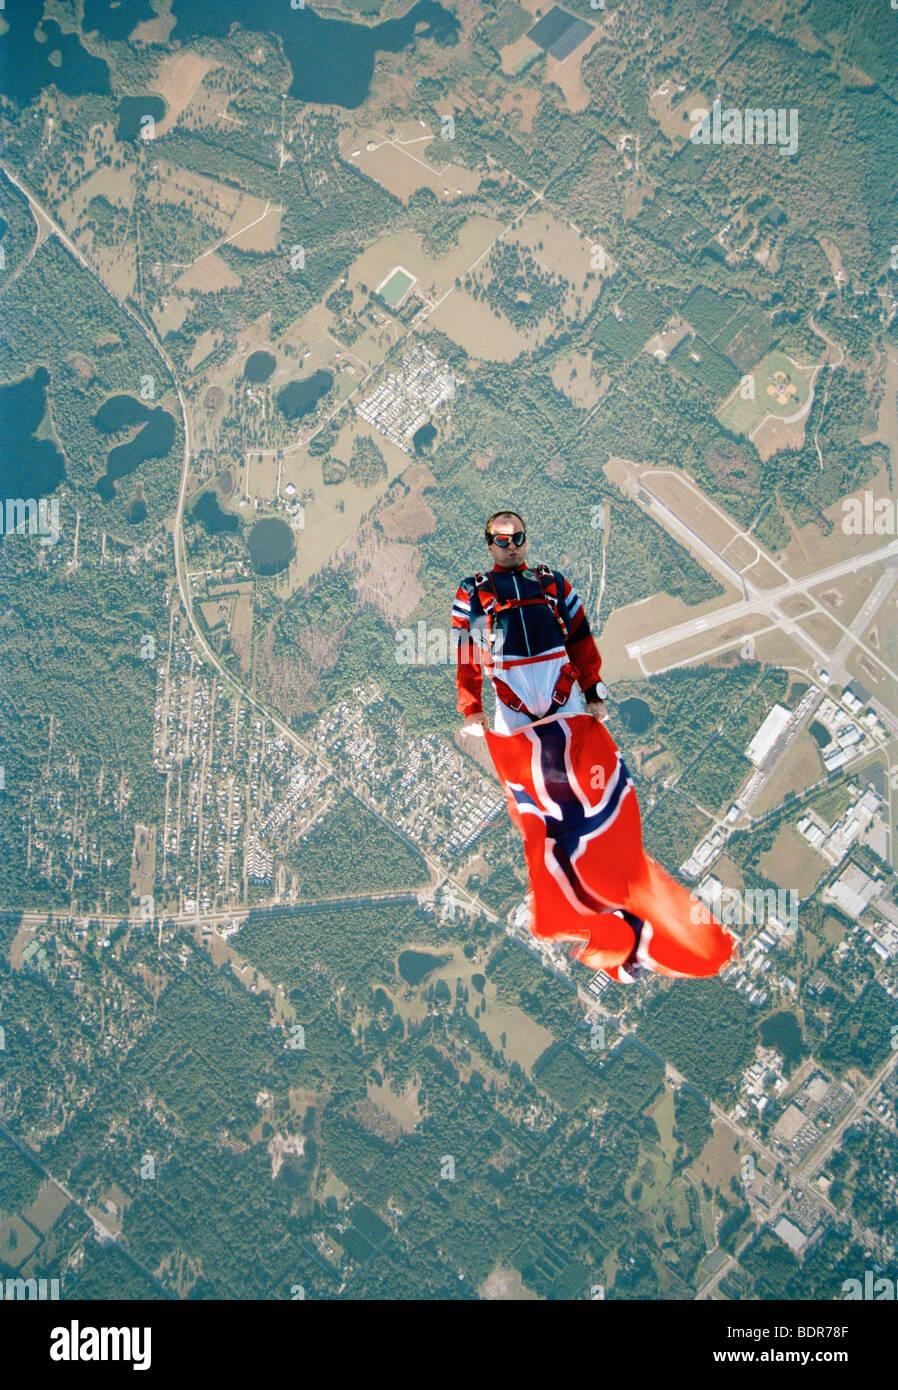 A parachute jumper holding a Norwegian flag USA. - Stock Image